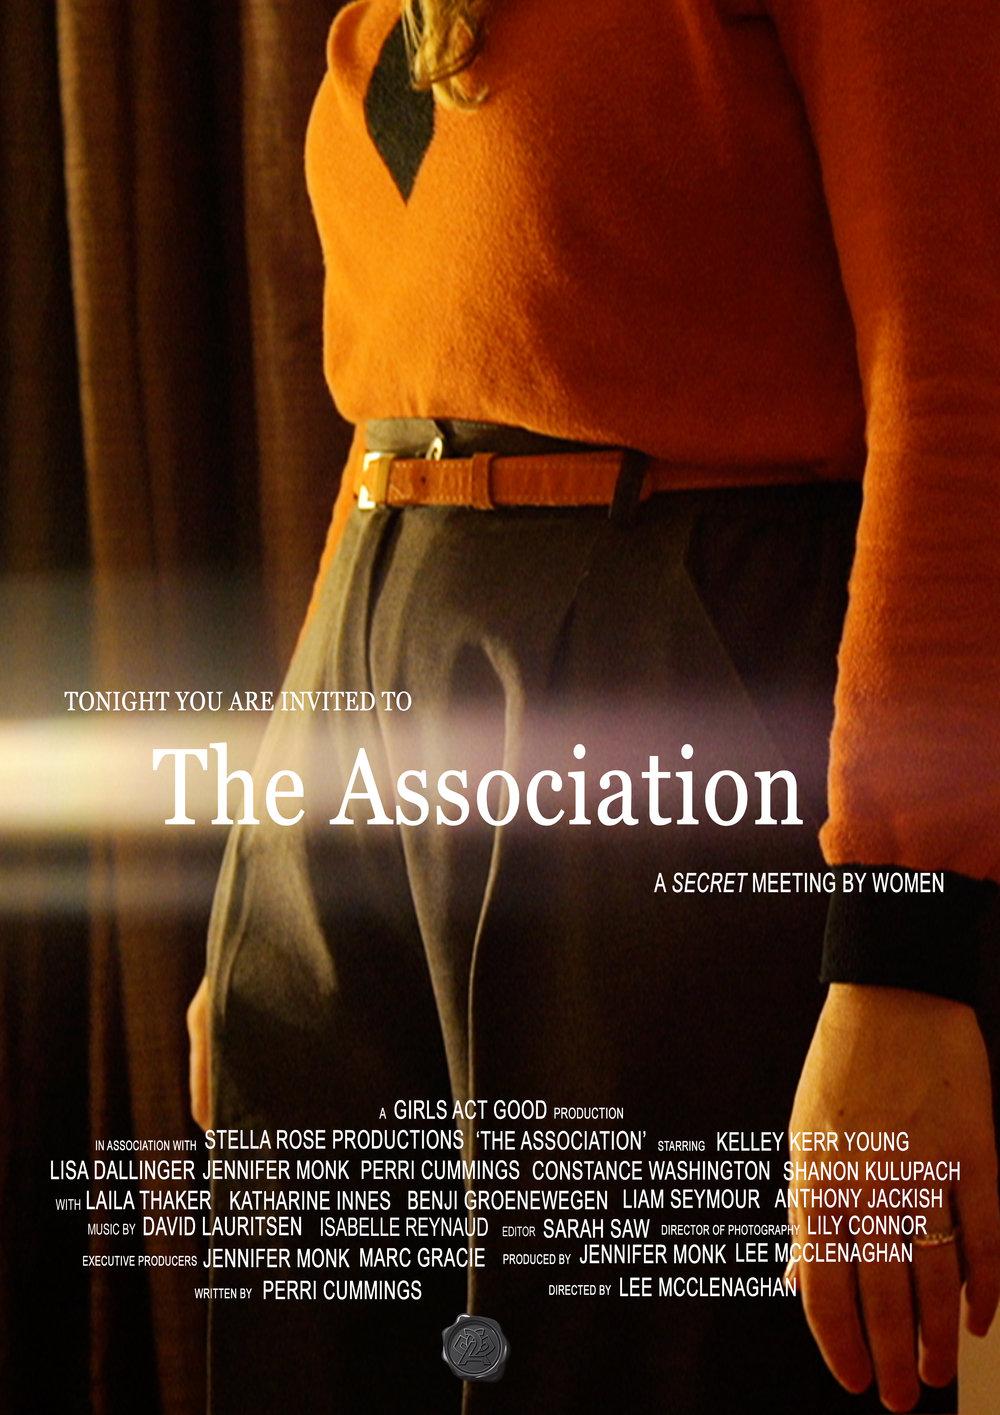 TheAssociation_Cinema_Poster.jpg